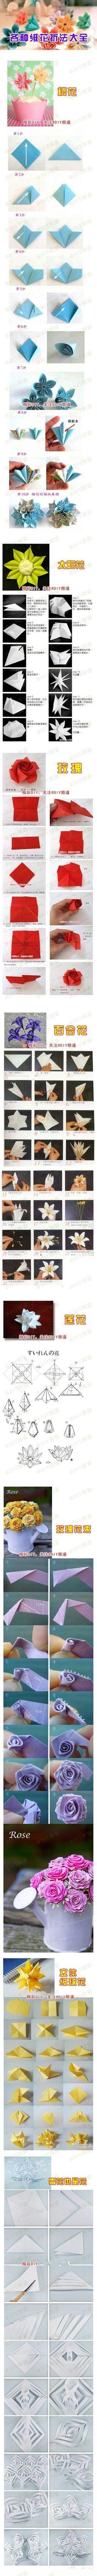 Flower origami